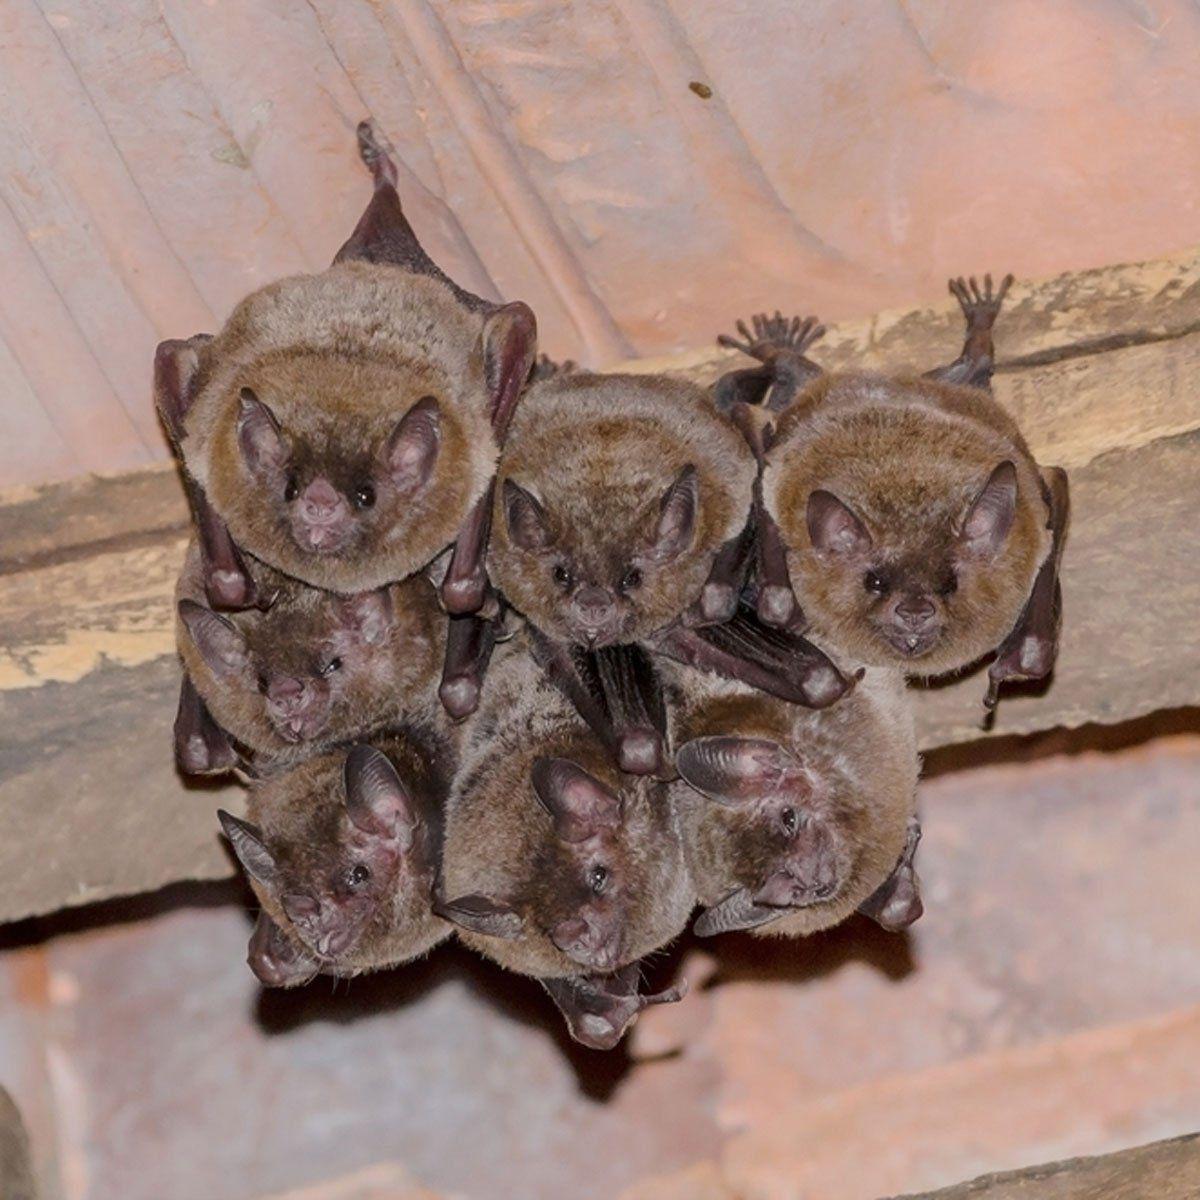 How to Prevent a Bat Problem Pest control, Mice